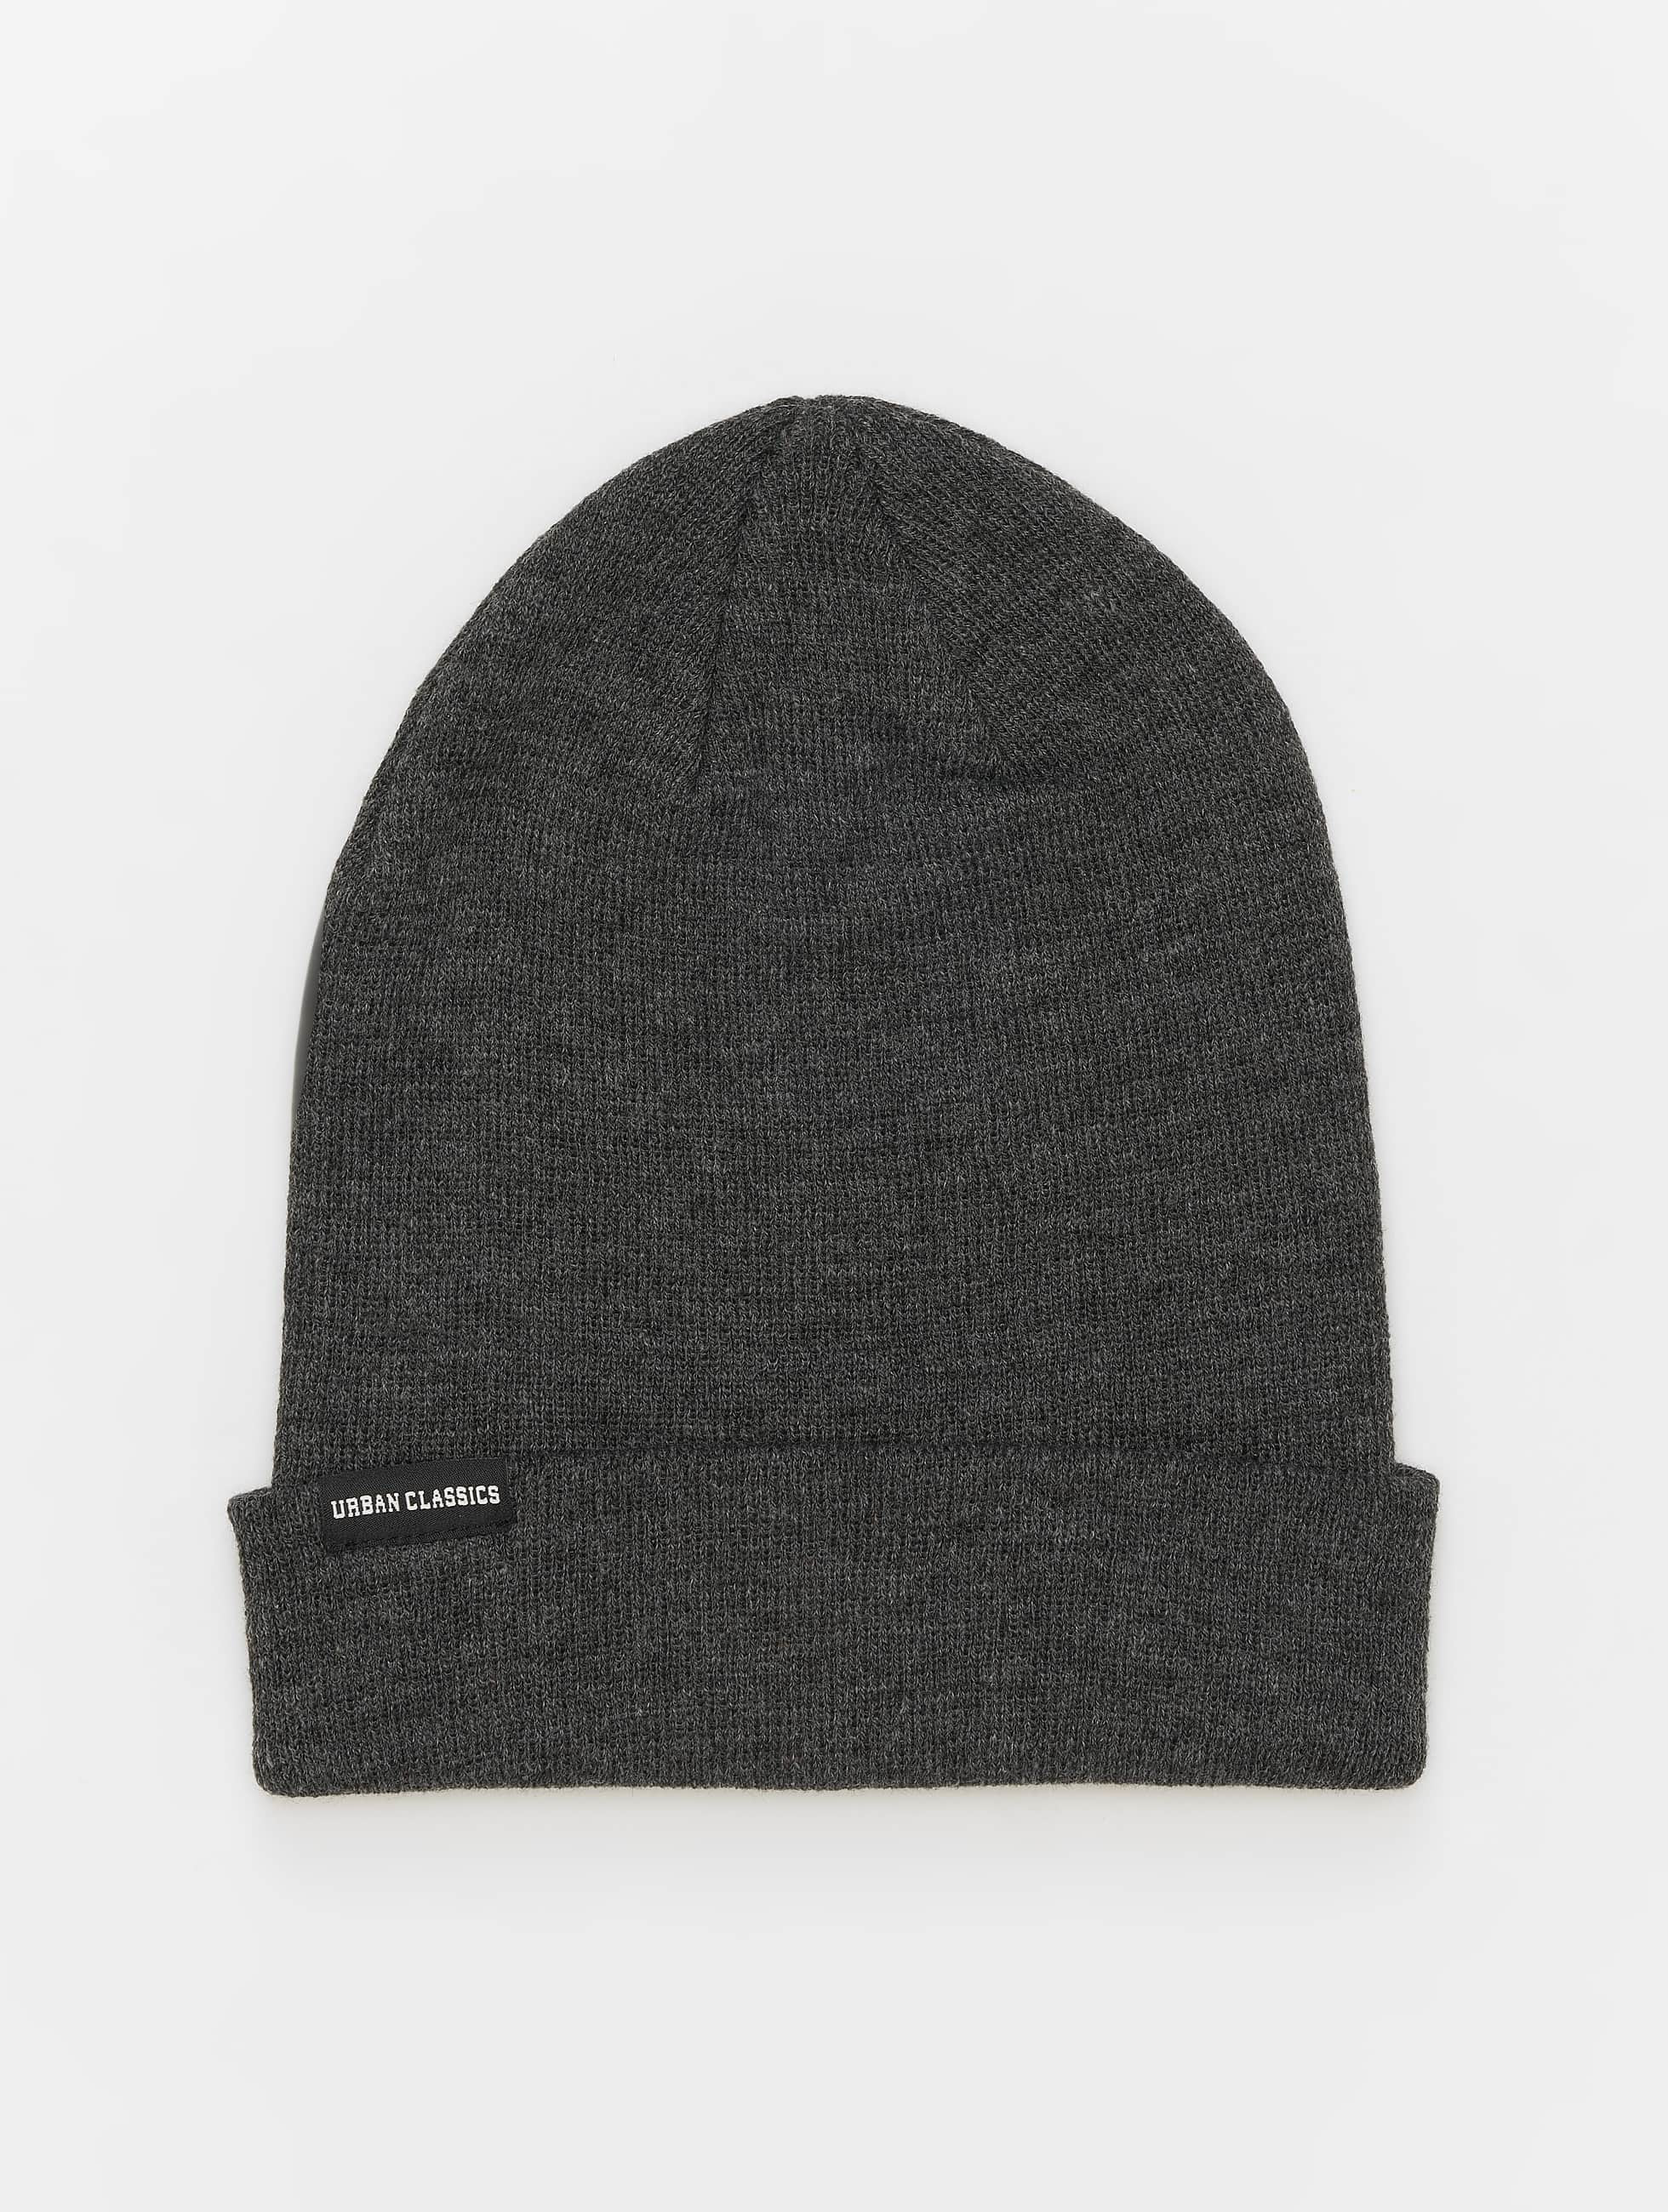 Urban Classics шляпа Long серый